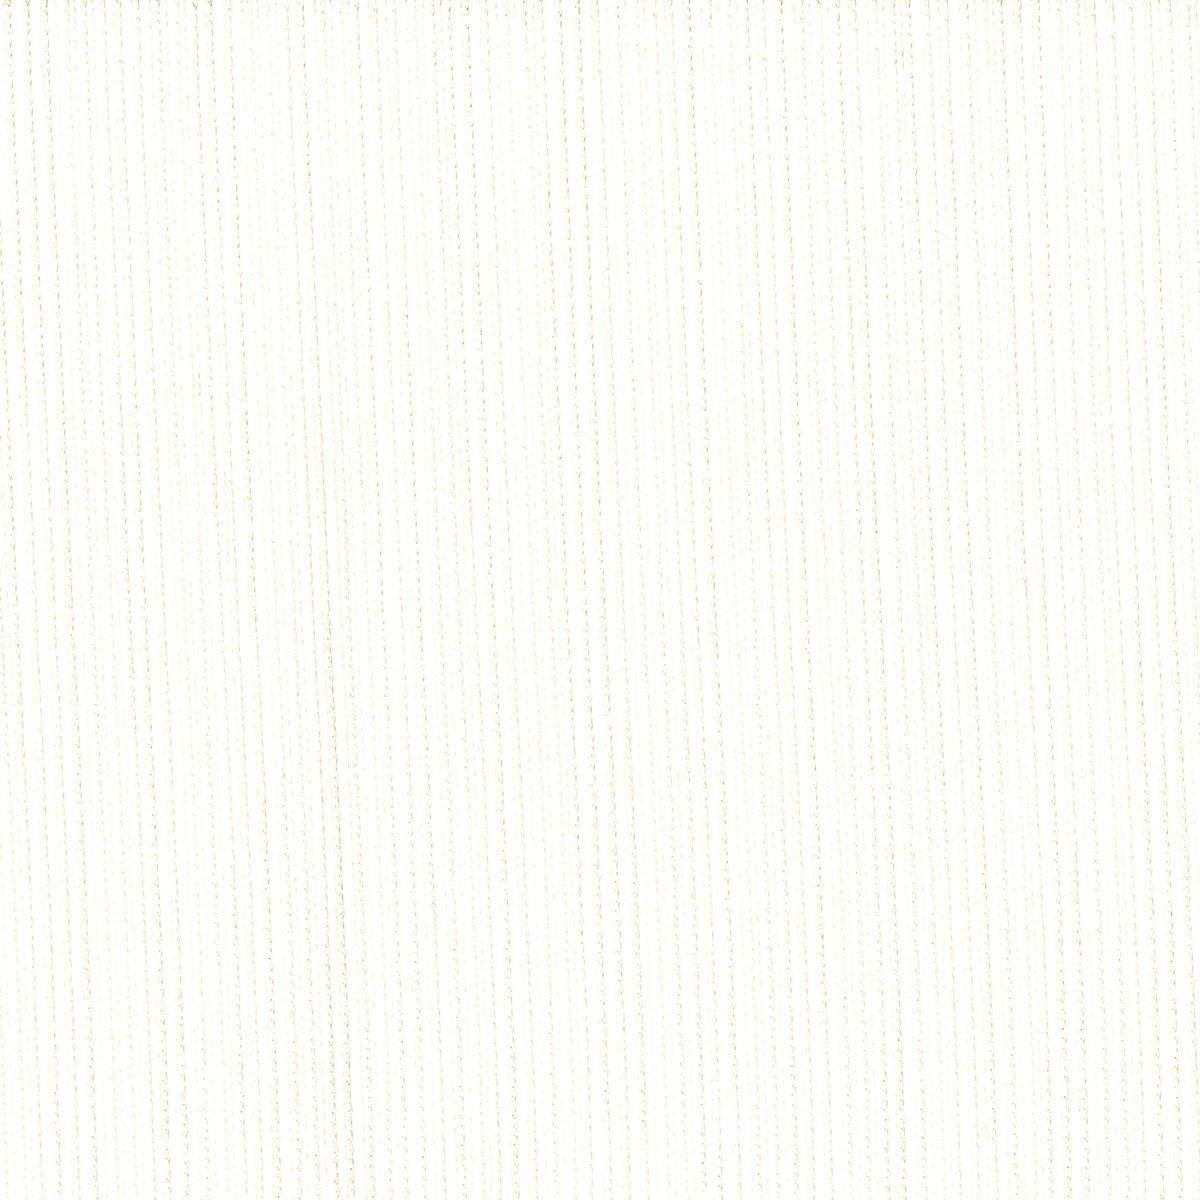 ANICHINI Fabrics | Lake Forest White Stock Contract Fabric - a white woven fabric